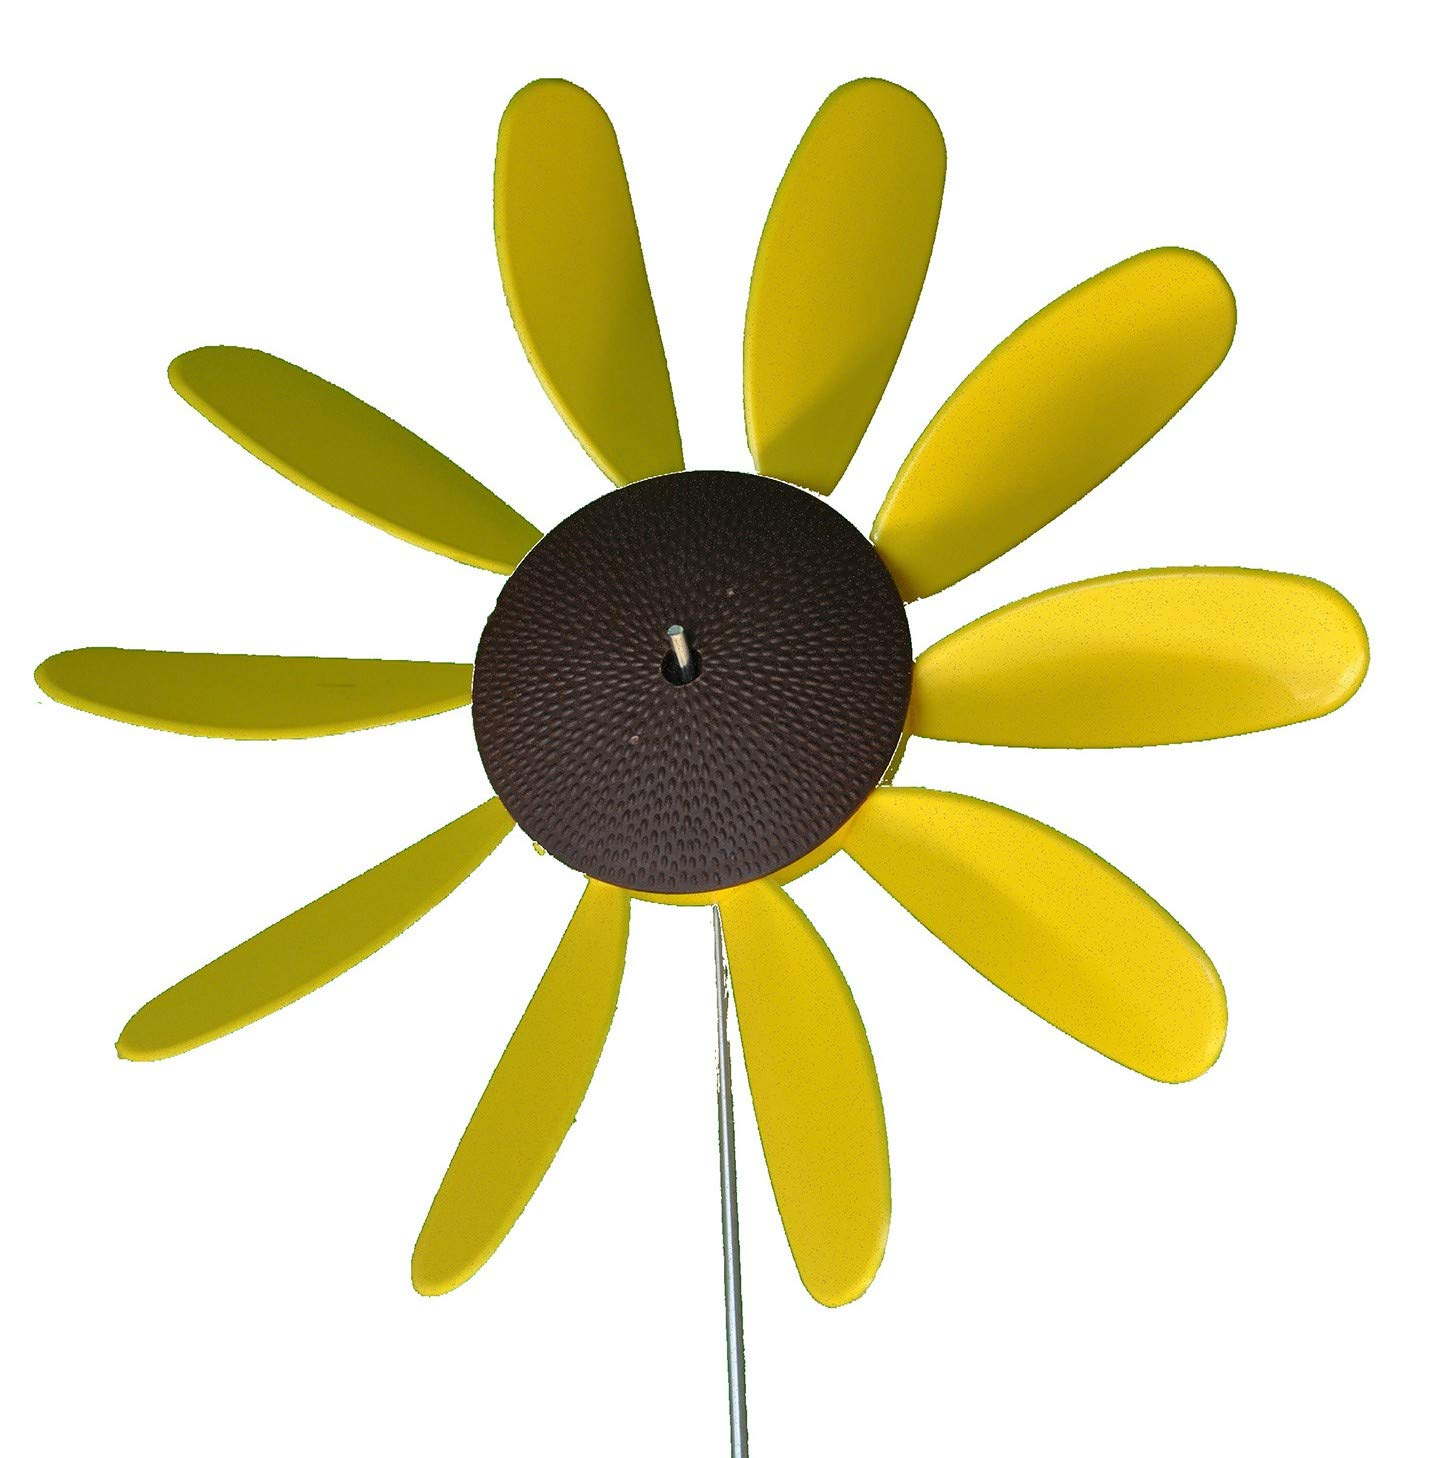 Beloit Plastics, LLC Classic Spinning Daisy (x6 case) SUNFLOWER, 12 inch dia by Beloit Plastics, LLC